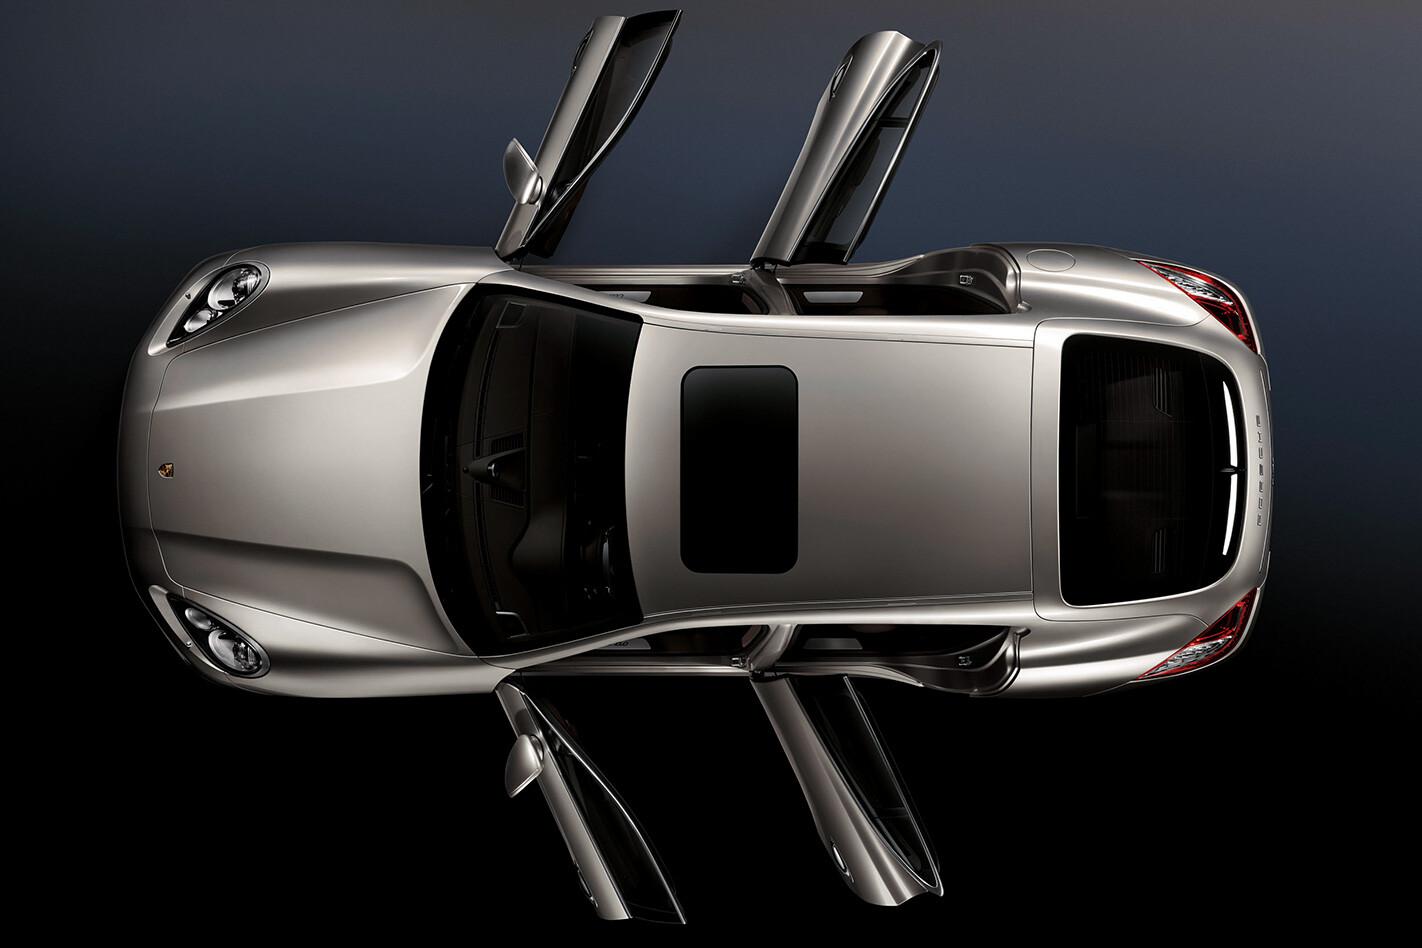 2010 Porsche Panamera Turbo birdseye